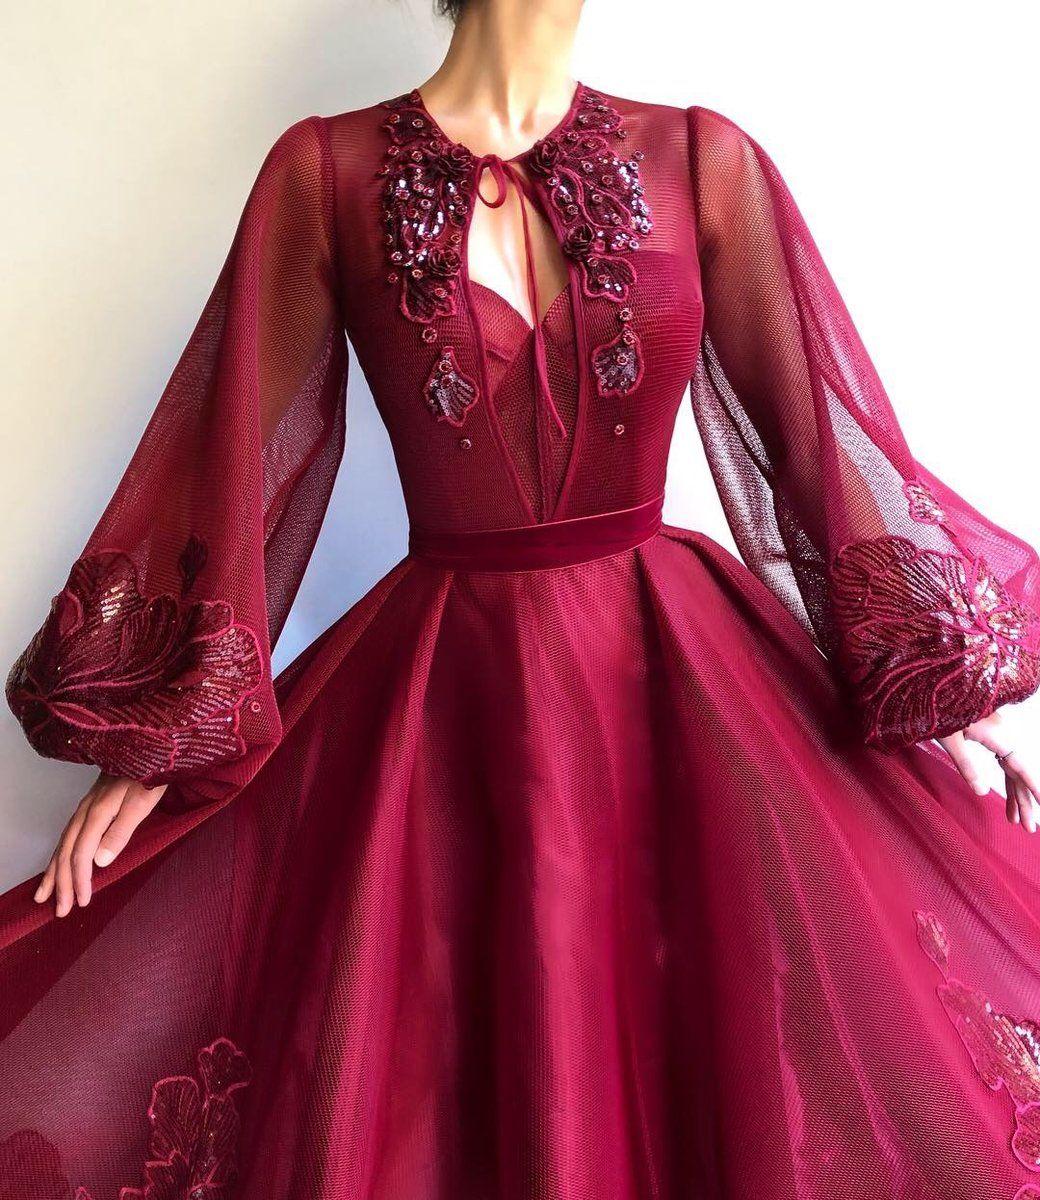 Burgundy QueenLove TMD Gown #flowerdresses